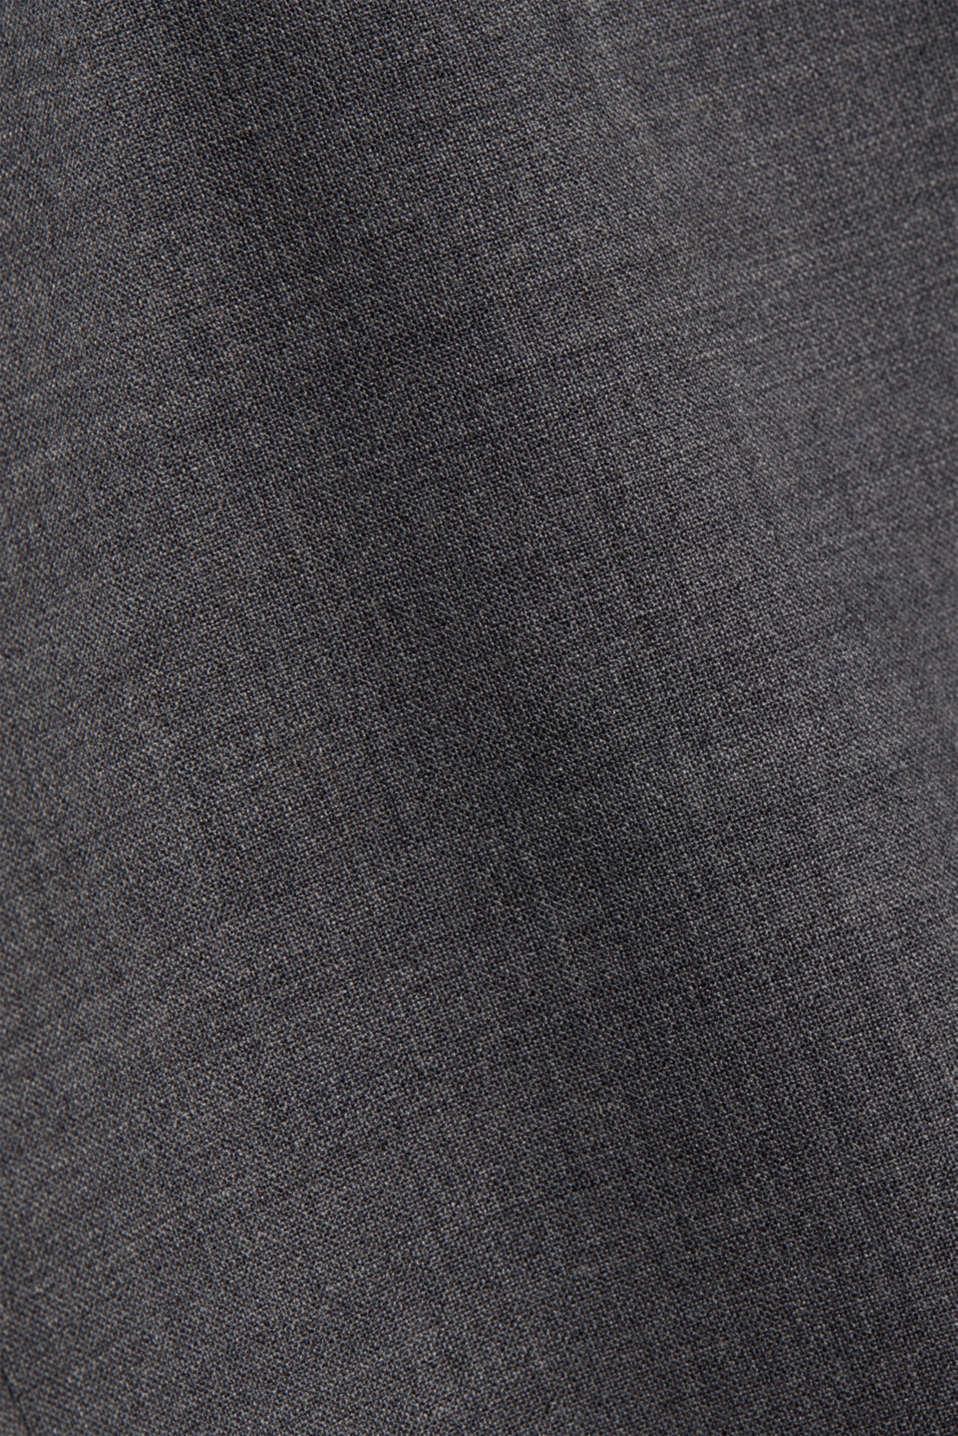 ACTIVE SUIT tailored jacket, wool blend, DARK GREY 5, detail image number 5